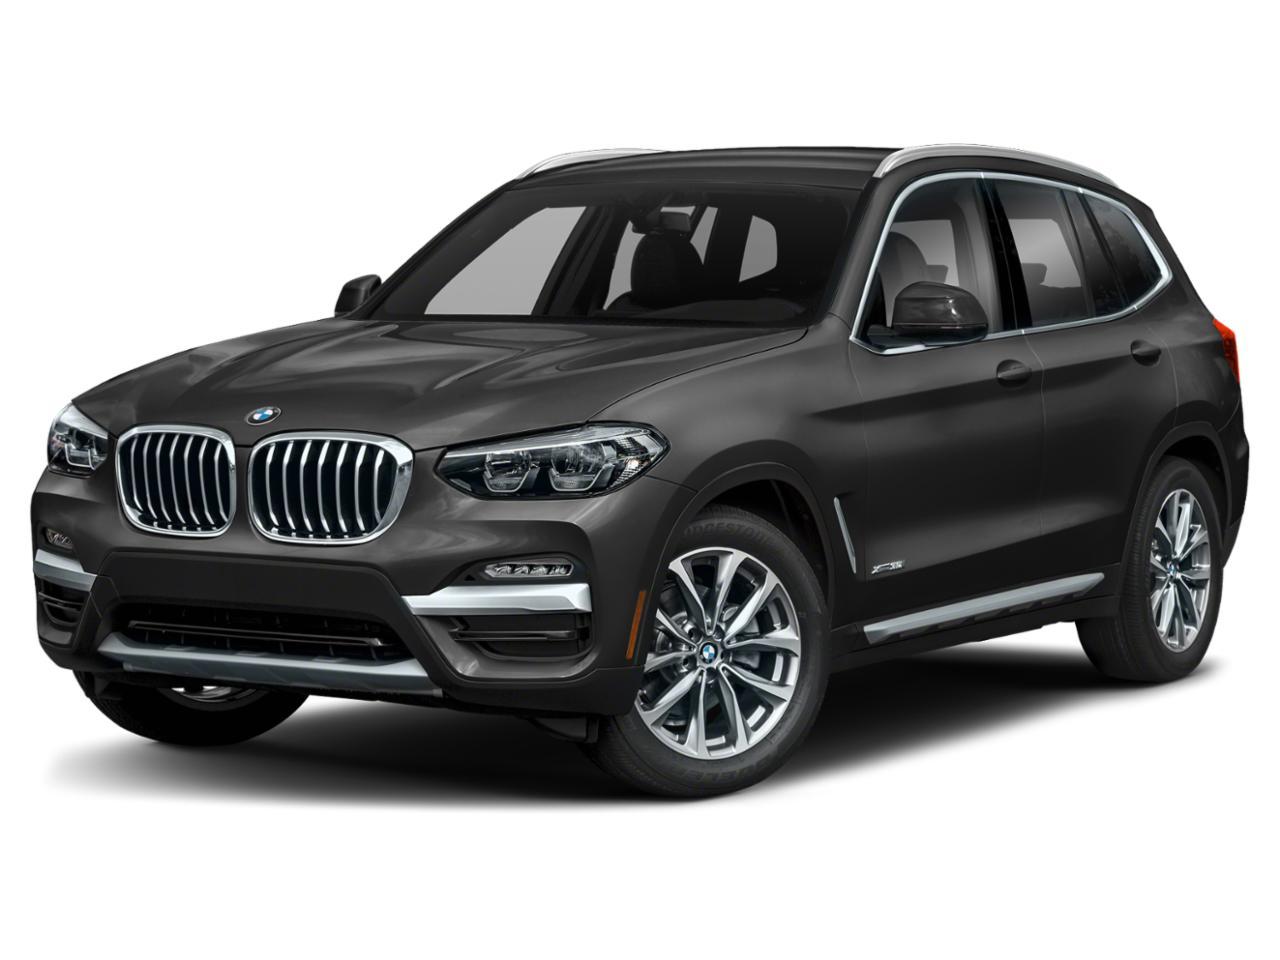 2019 BMW X3 sDrive30i Vehicle Photo in Charleston, SC 29407